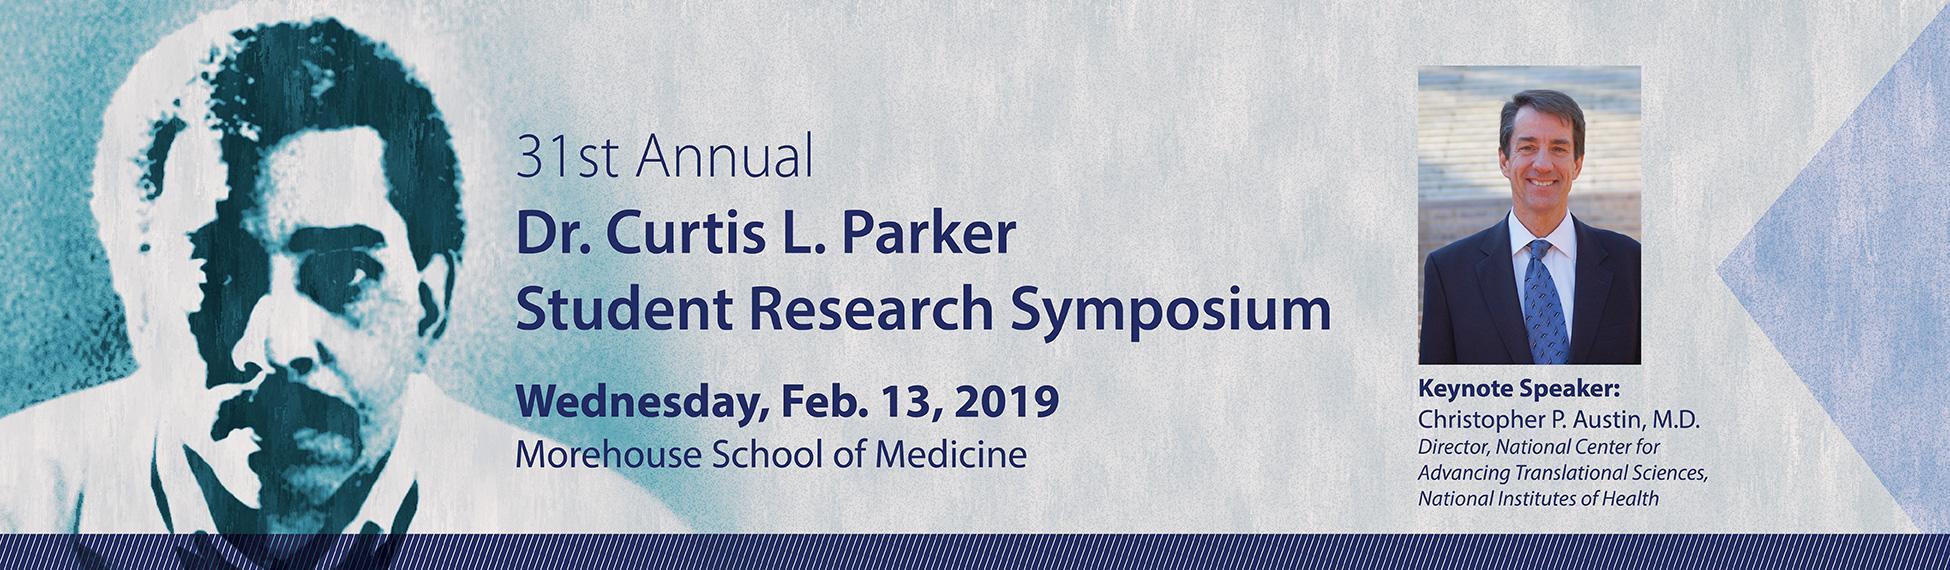 Dr. Curtis L. Parker Student Research Symposium